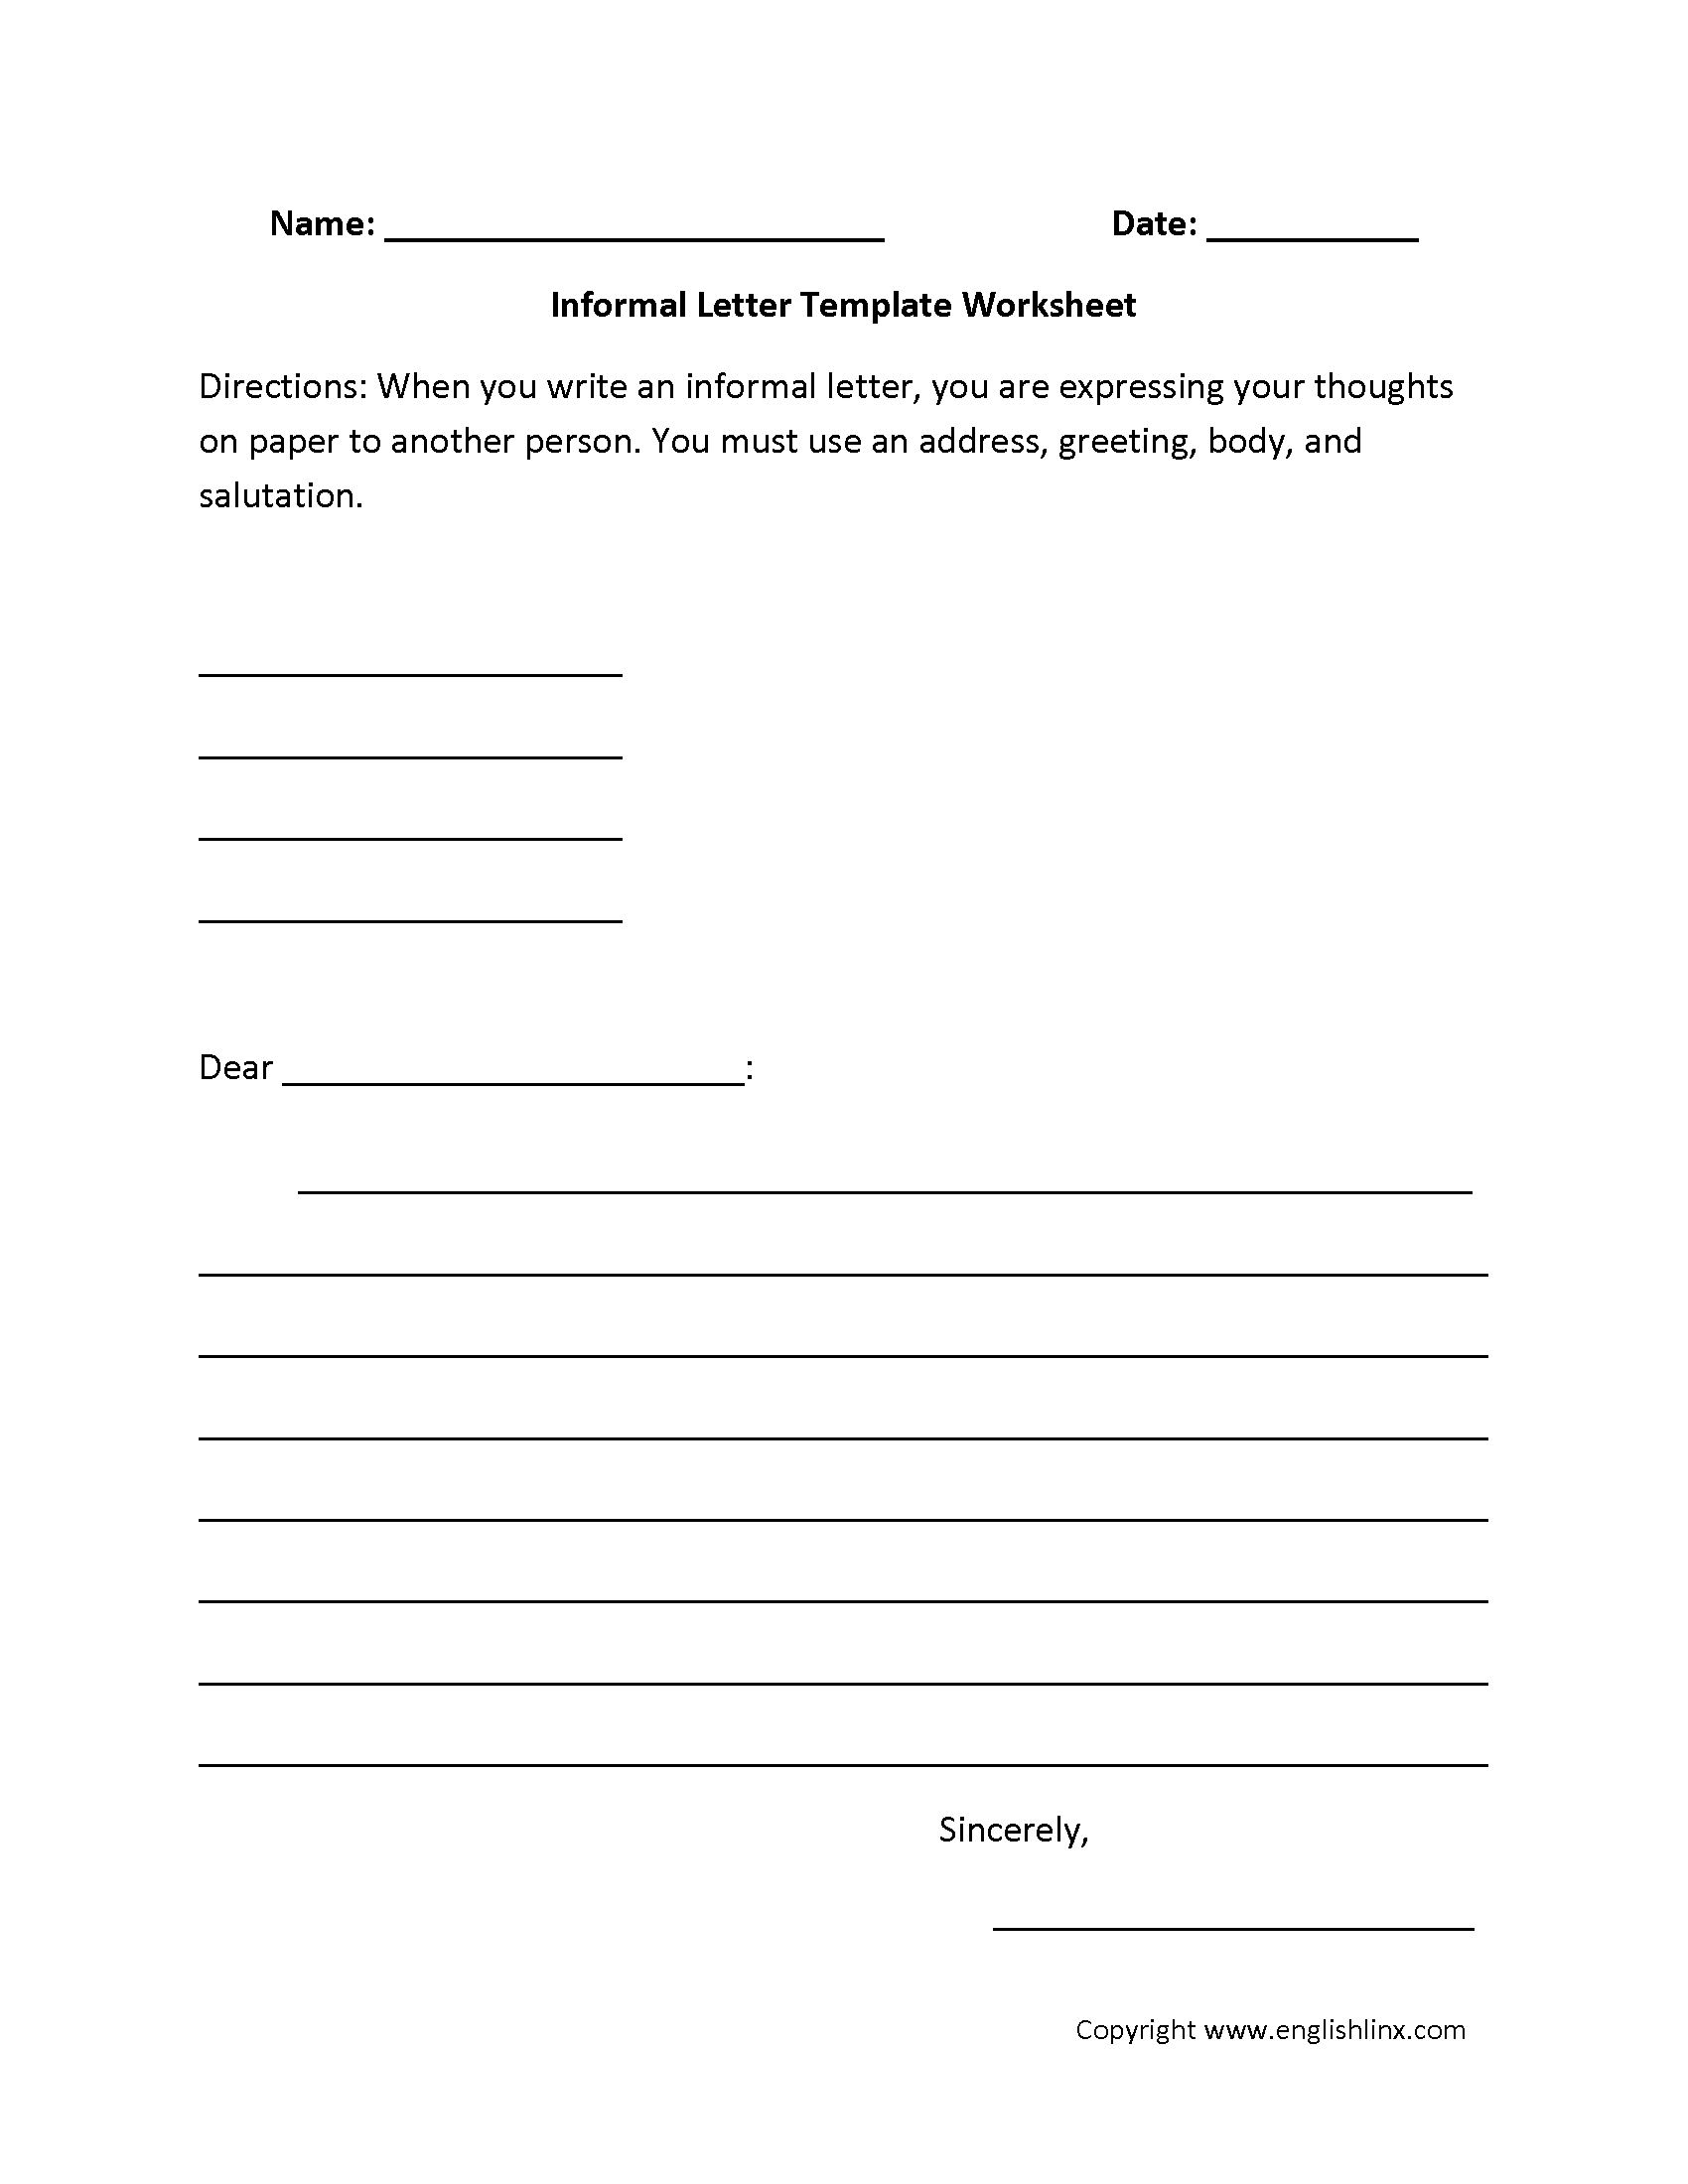 Informal Letter Writing Worksheets   Letter writing worksheets [ 2200 x 1700 Pixel ]